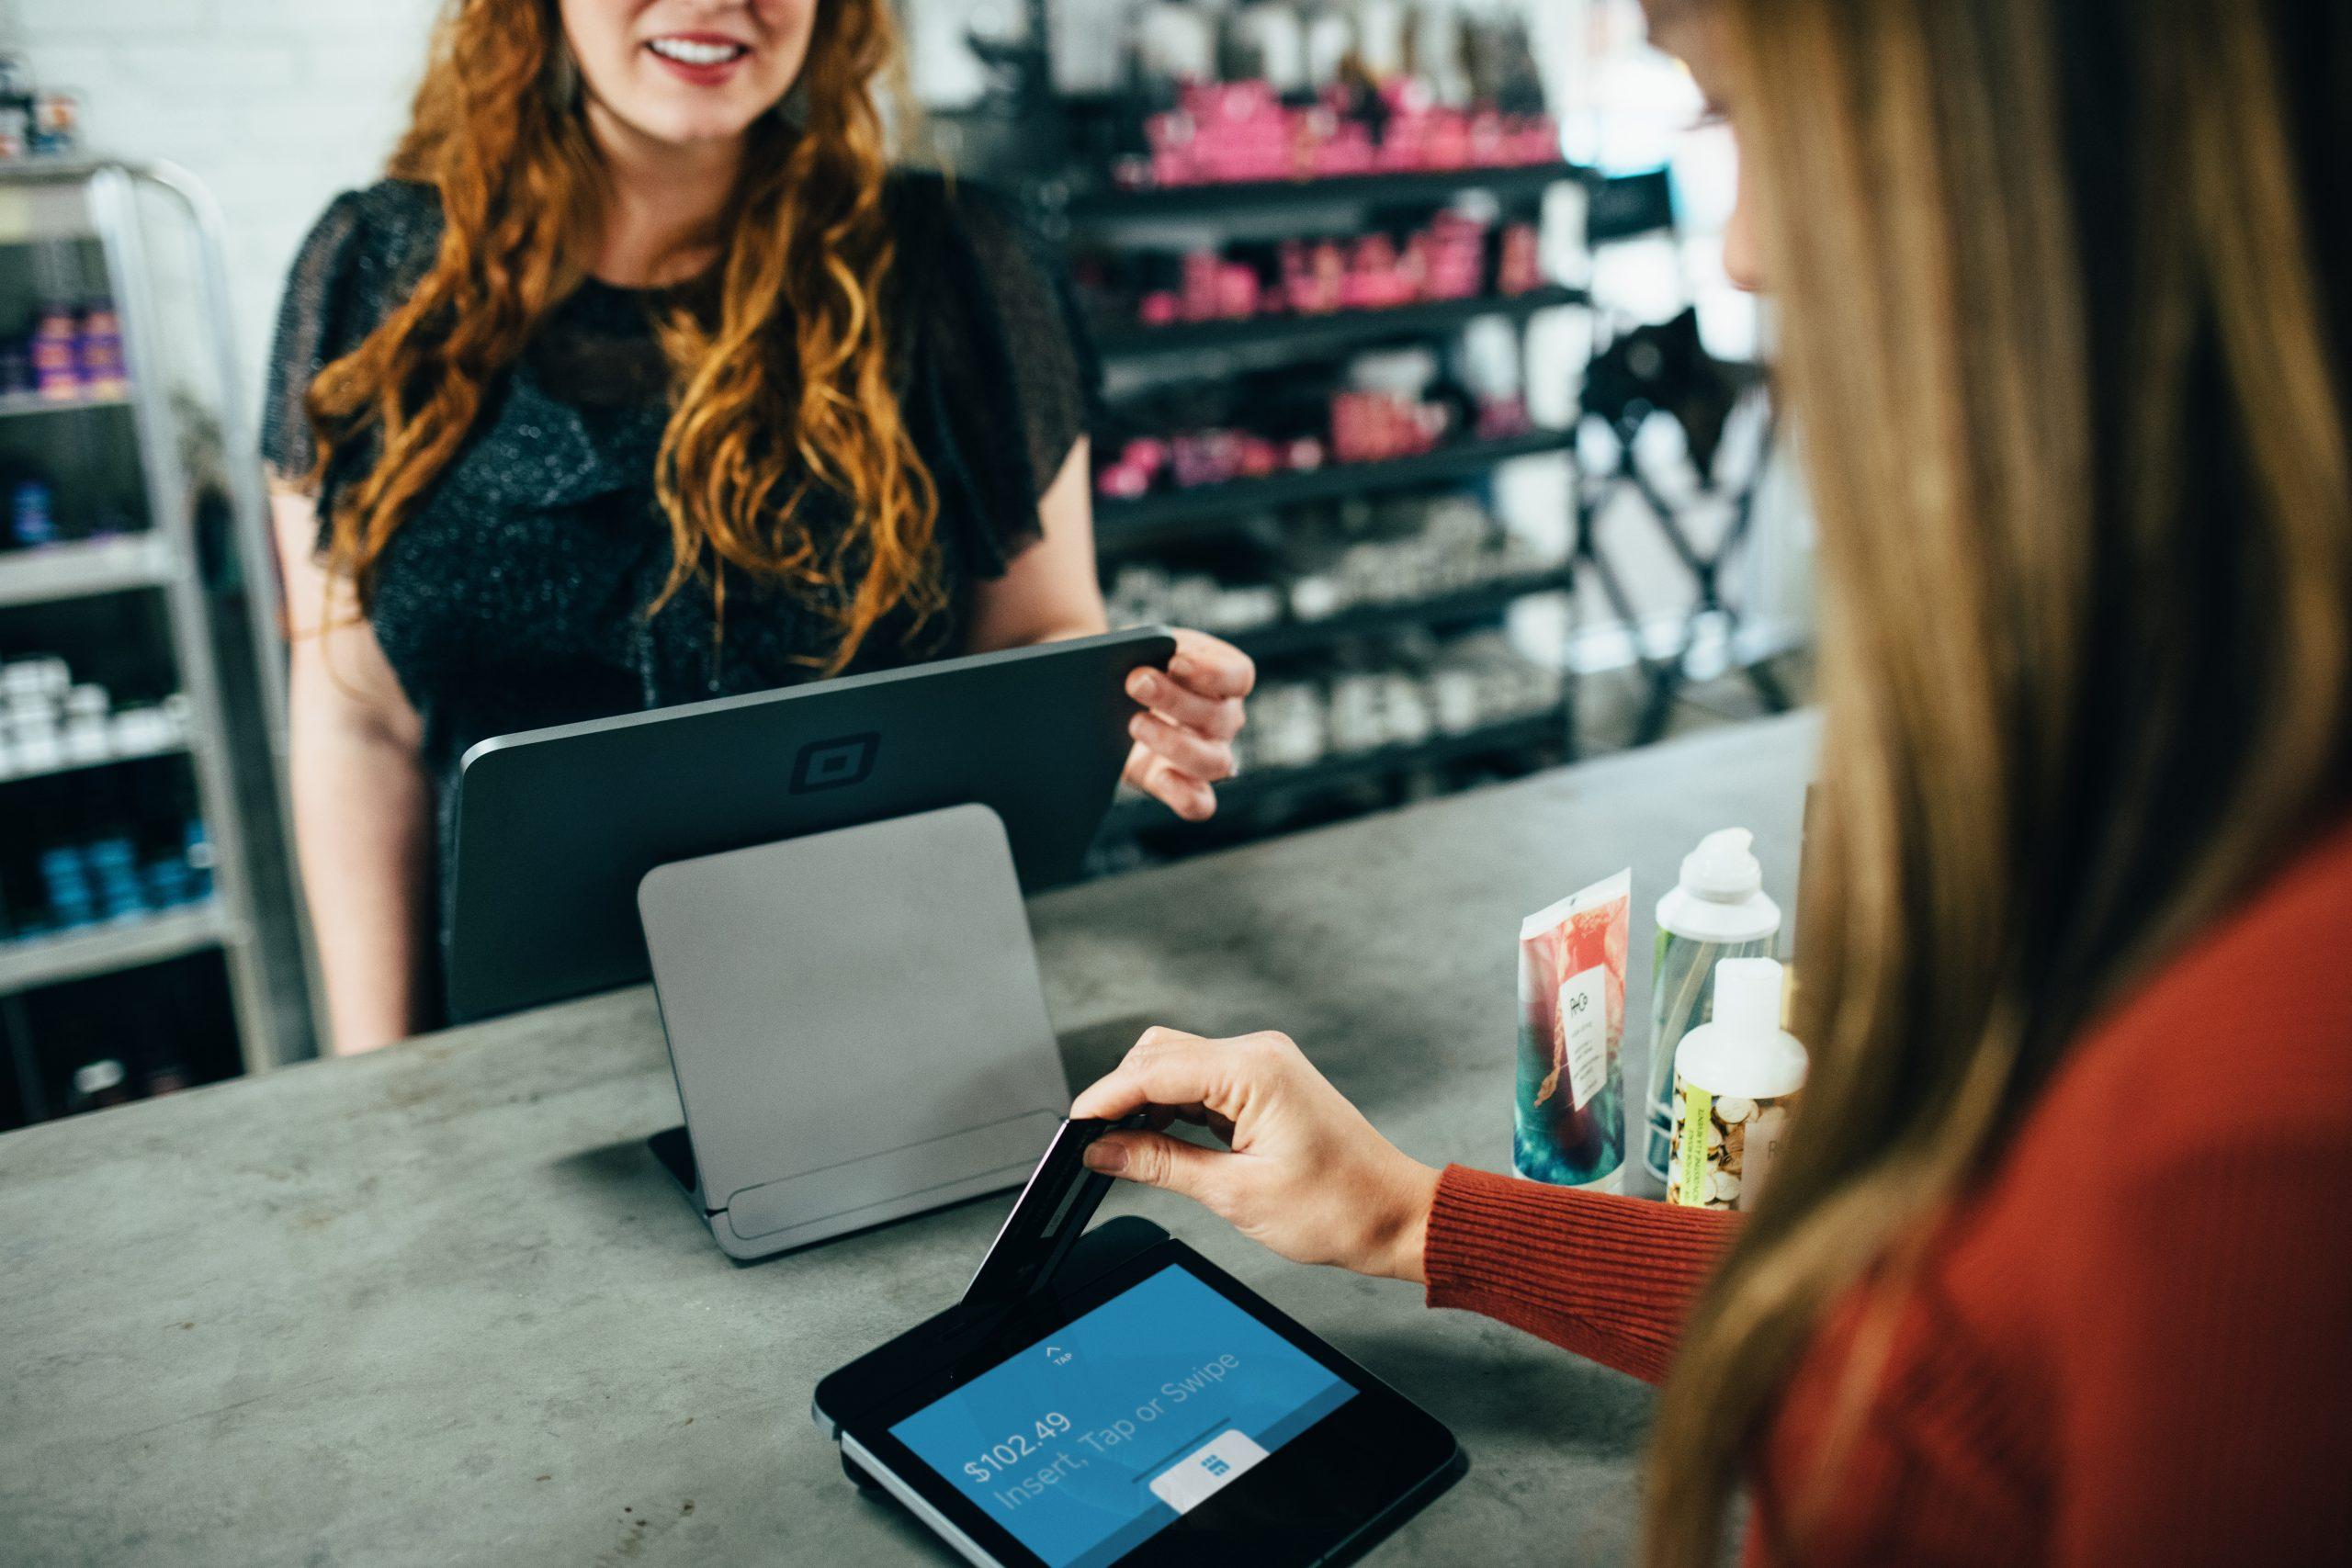 woman paying using credit card